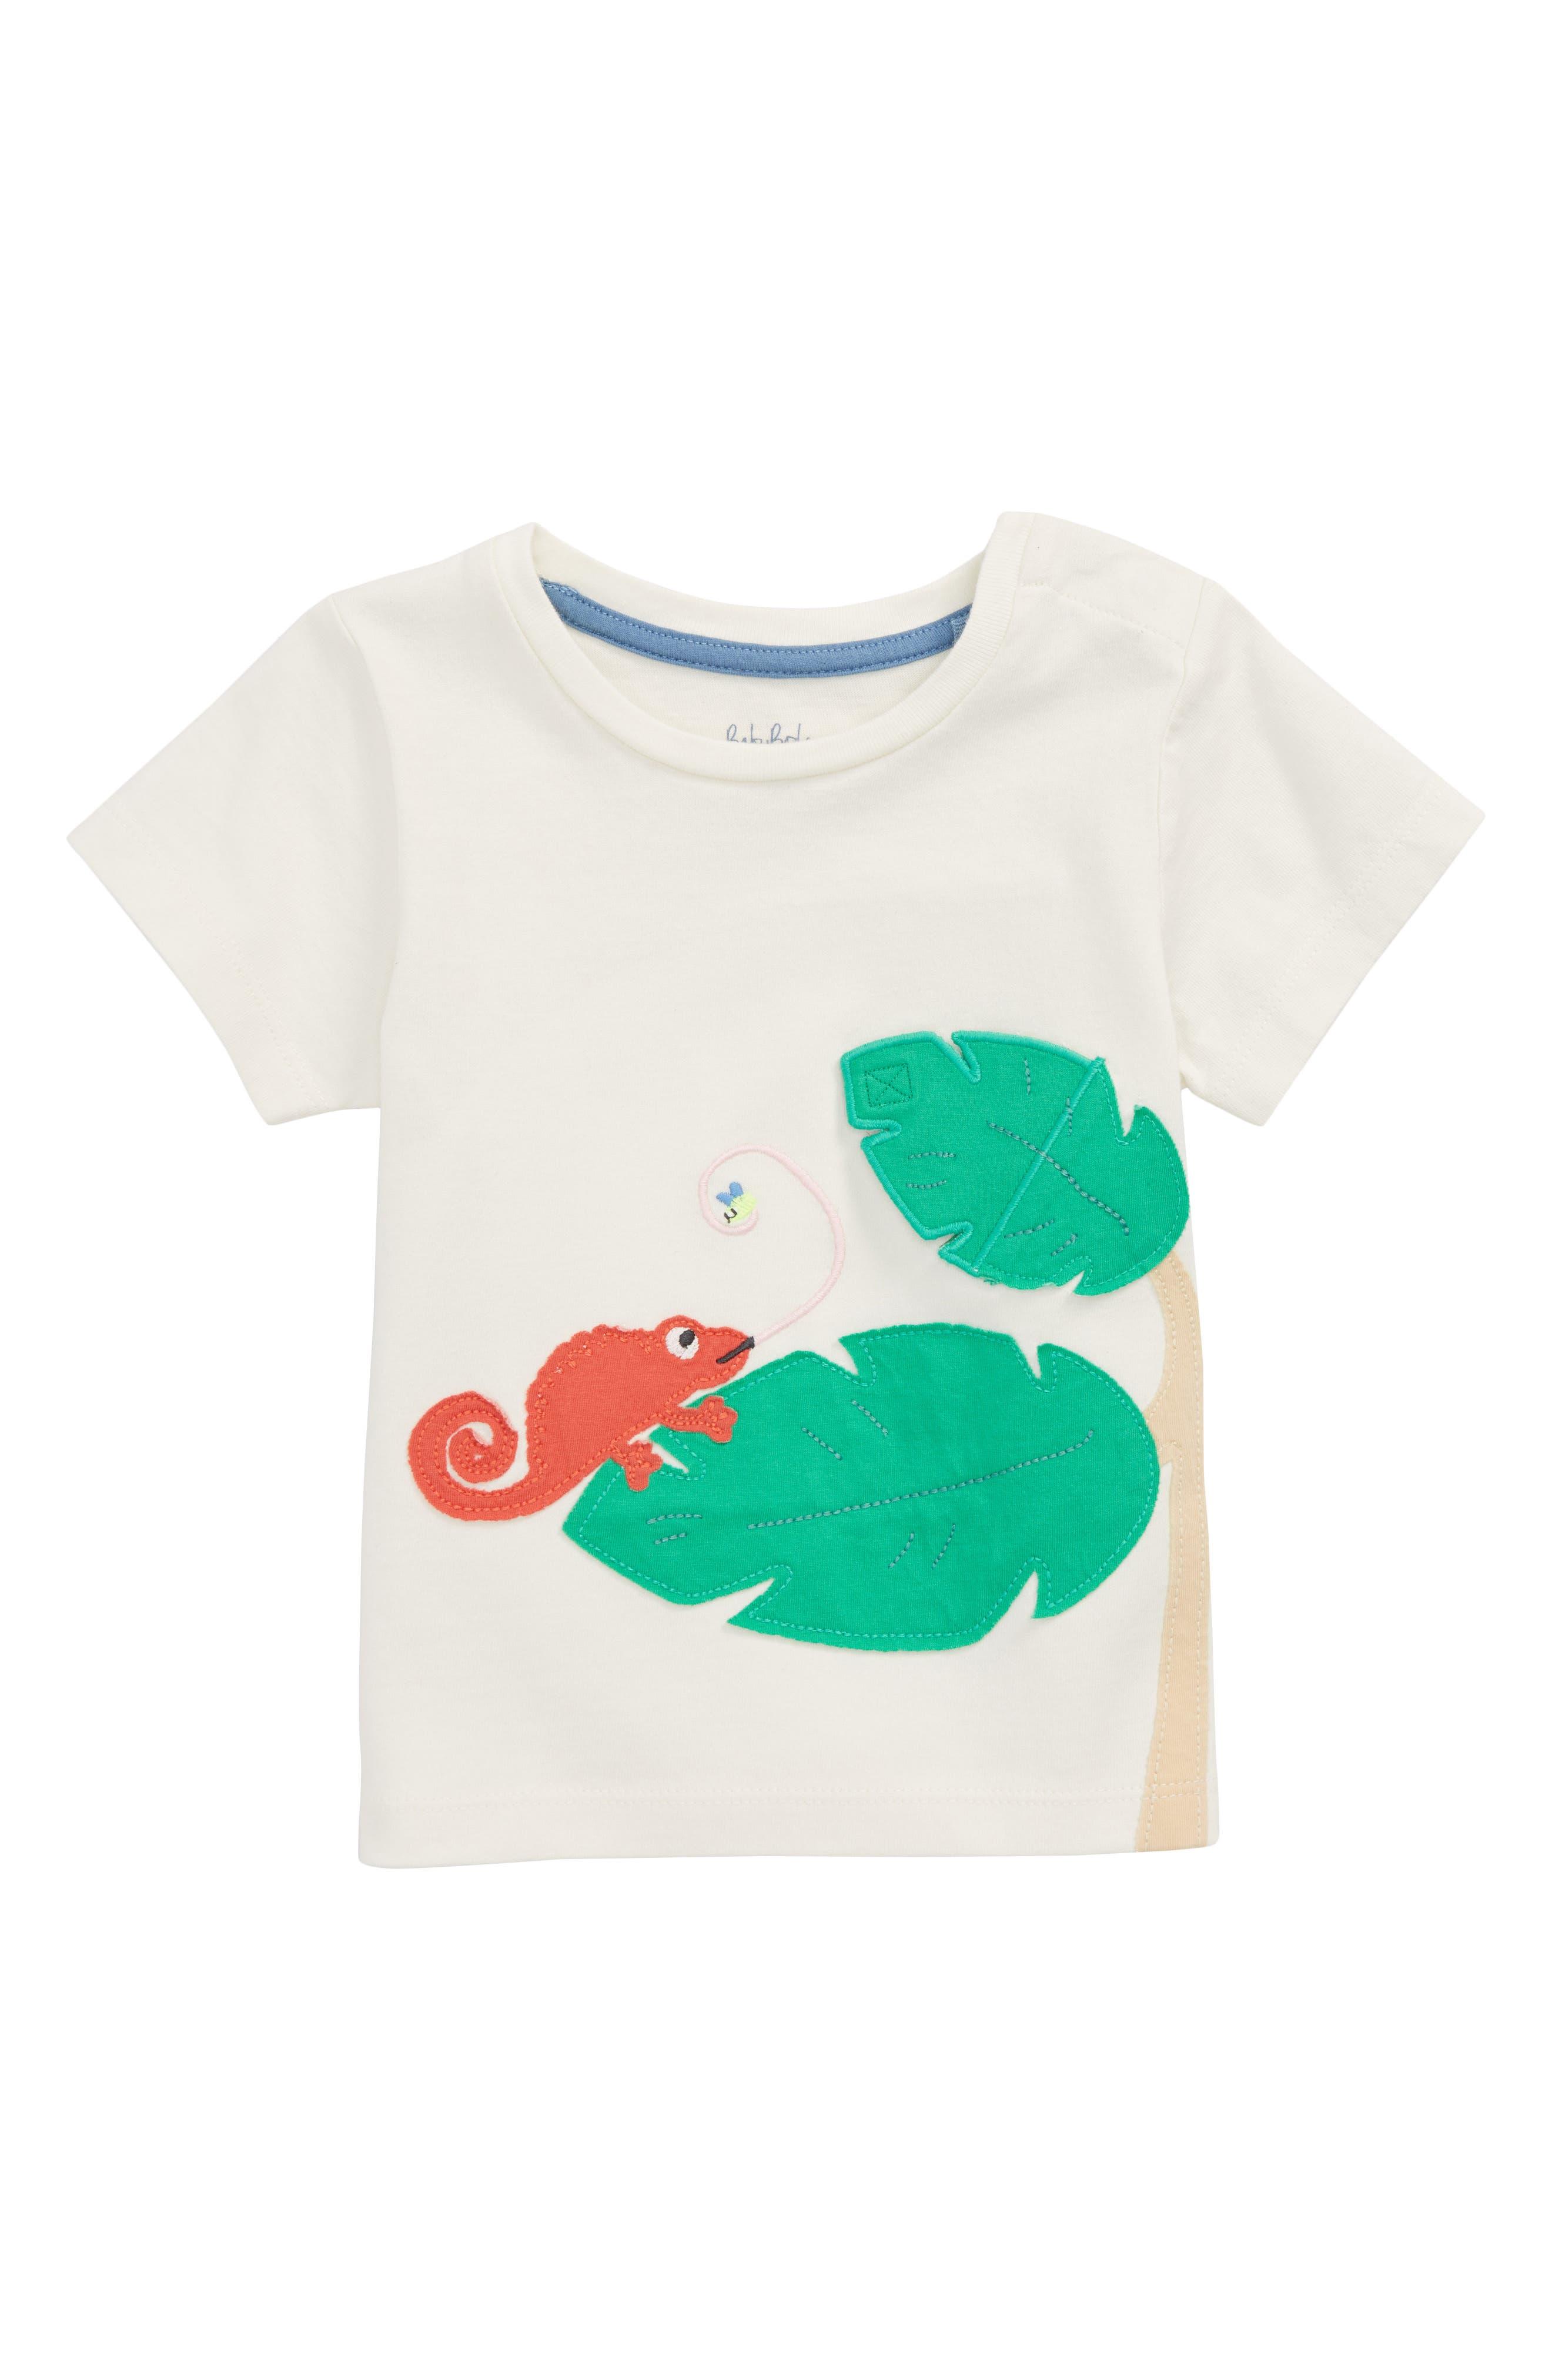 Peekaboo T-Shirt,                             Main thumbnail 1, color,                             Ivory Lizards